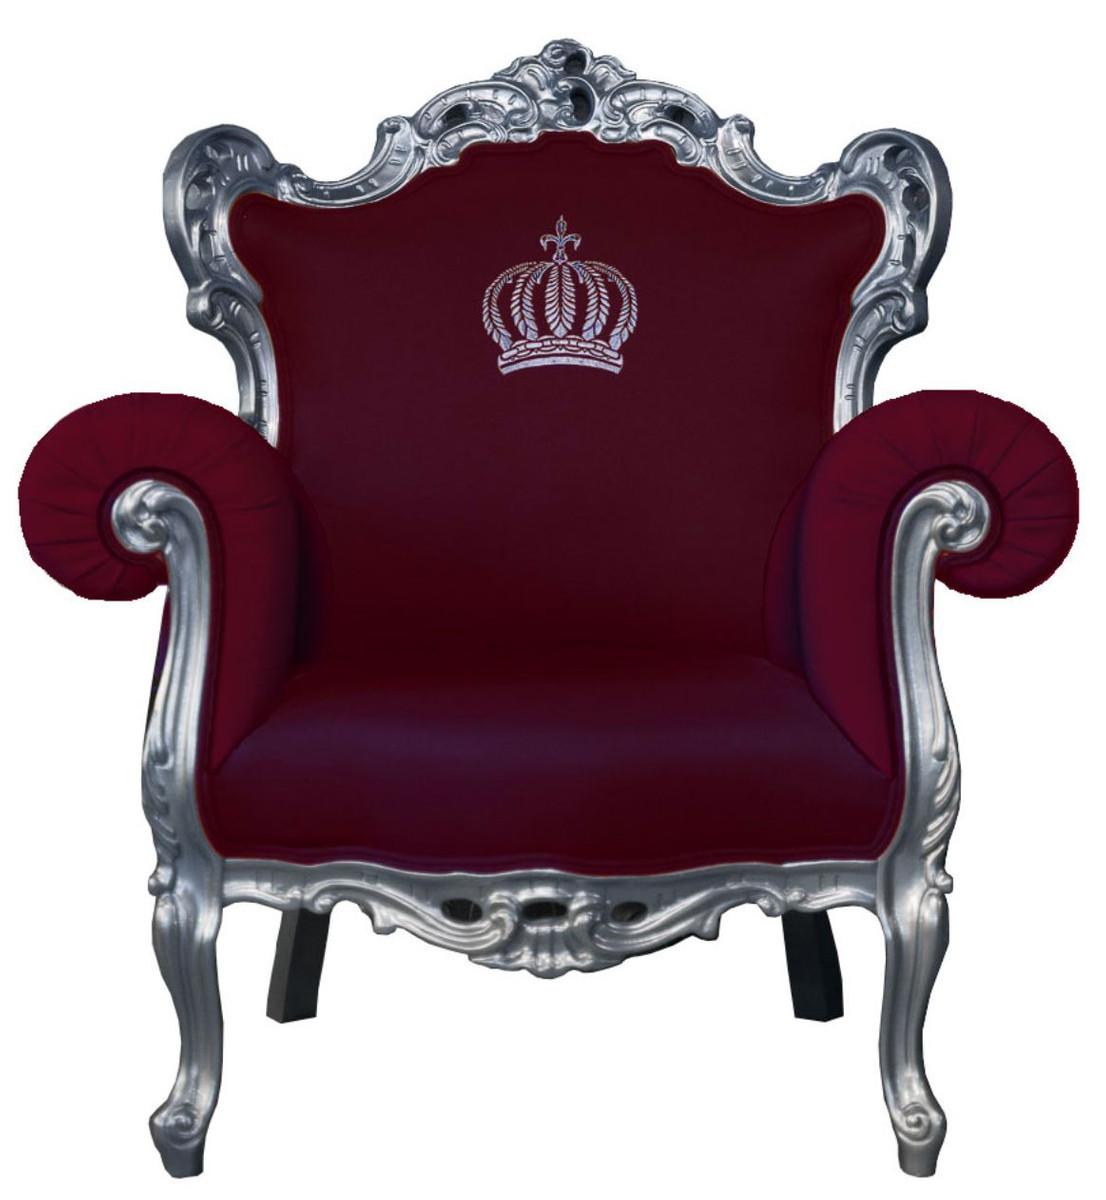 Pompöös By Casa Padrino Luxury Baroque Armchair Burgundy / Silver   Pompöös Baroque  Armchair Designed By